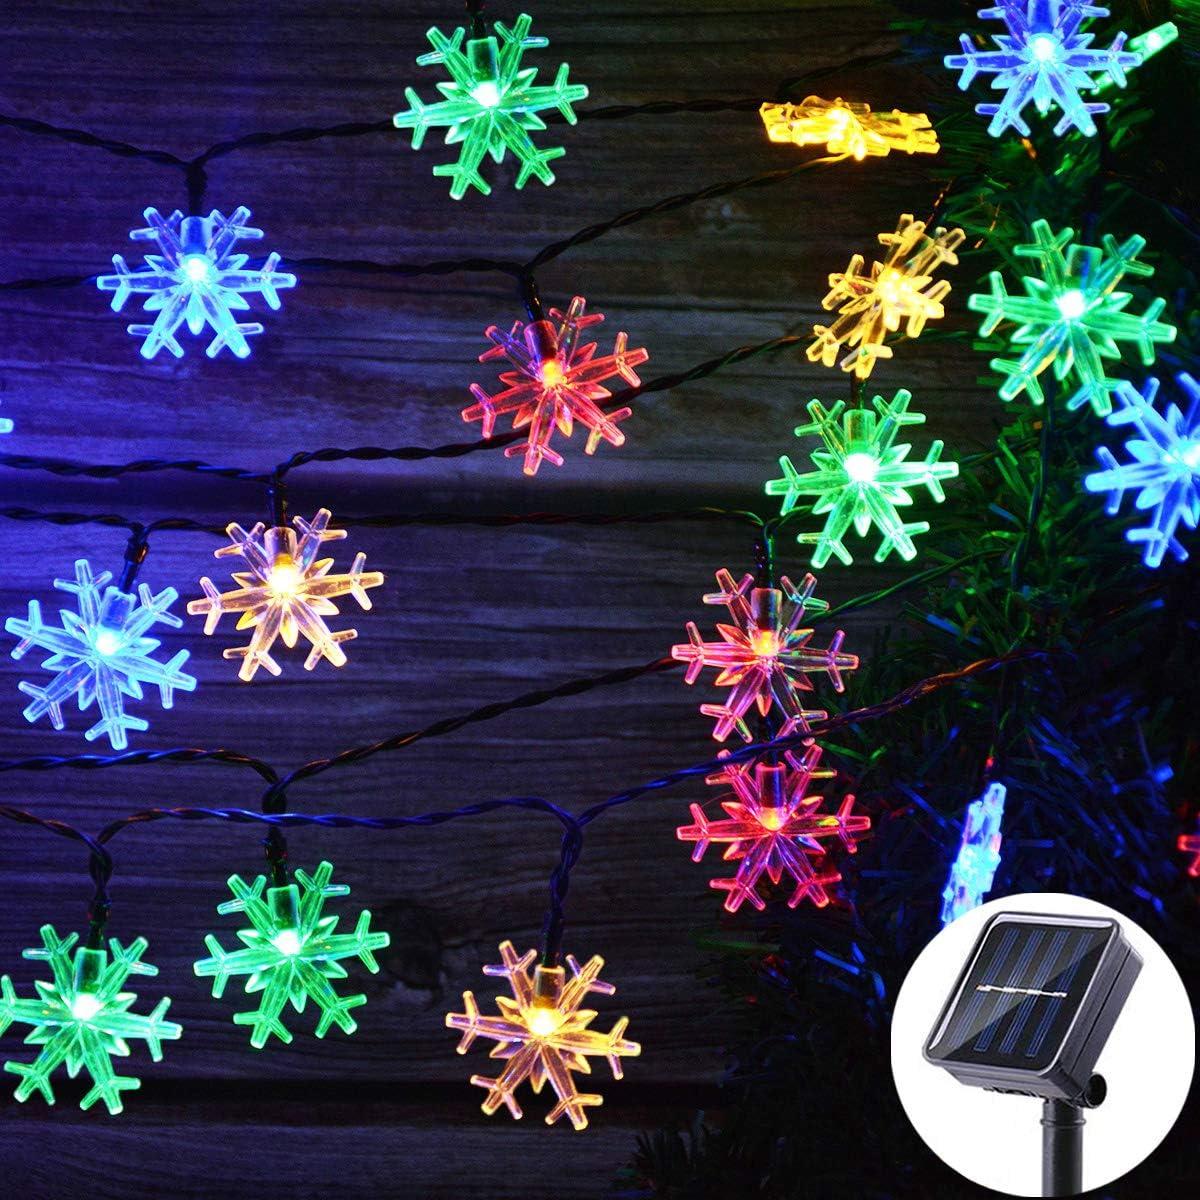 Viewpick Solar Christmas Snowflake String Lights, 50 LED Multicolor Christmas Fairy Lights Waterproof Solar Christmas Lights Outdoor Crystal Decor Lights for Christmas Tree Railing Garden Fence Decor